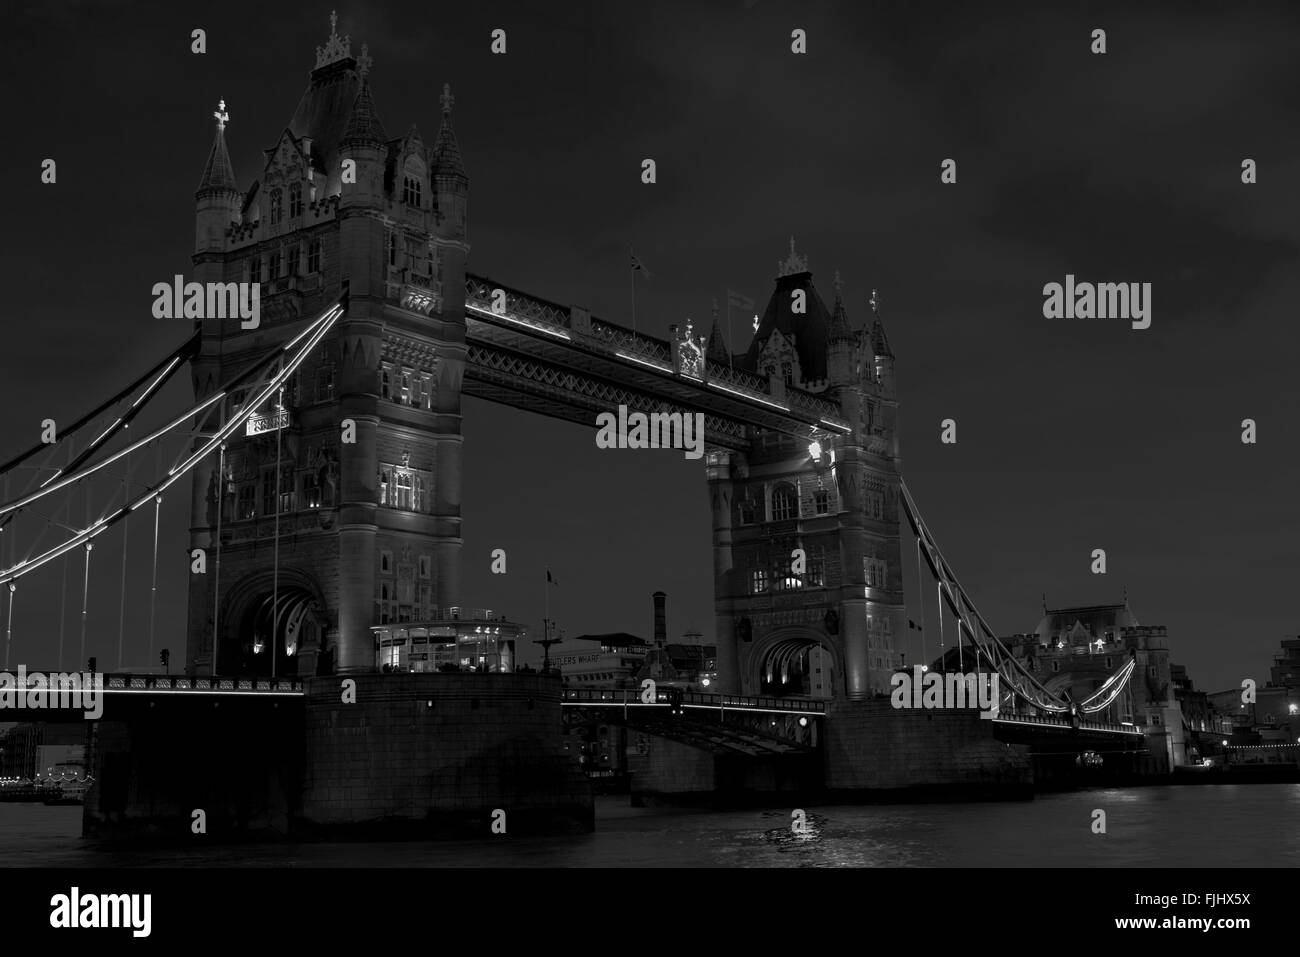 Tower Bridge illuminated at night, black and white image - Stock Image